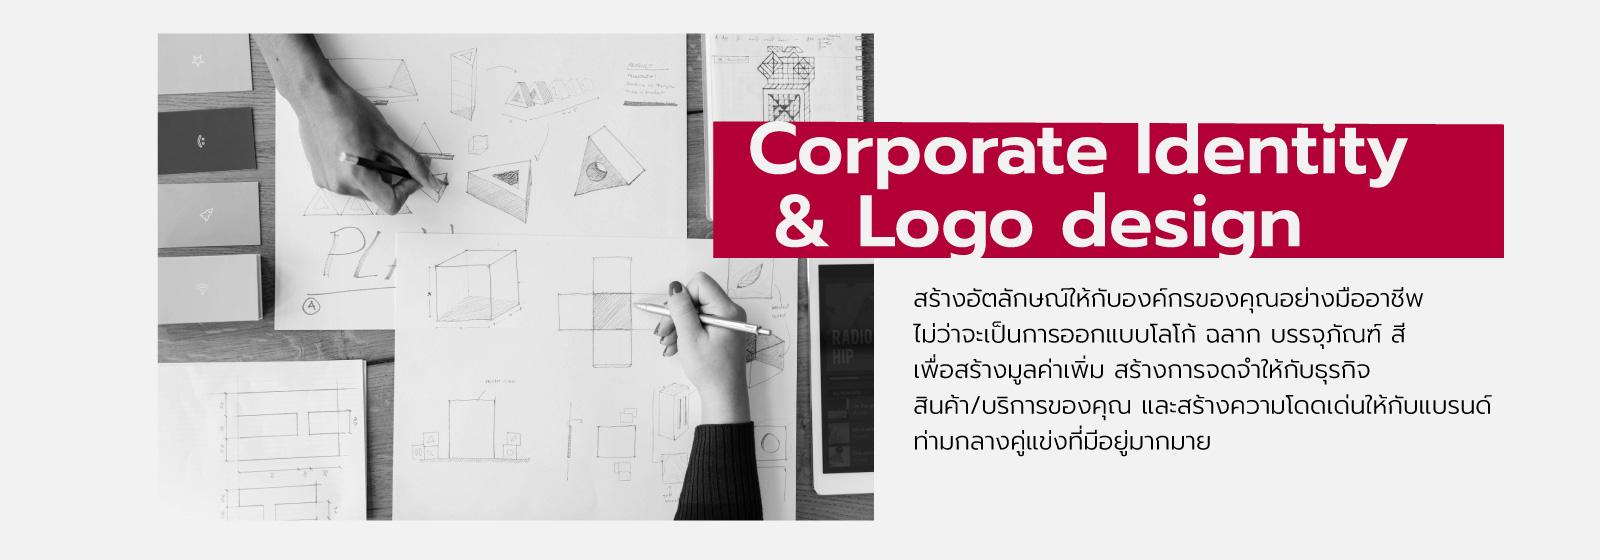 Corporate Identity & Logo Design